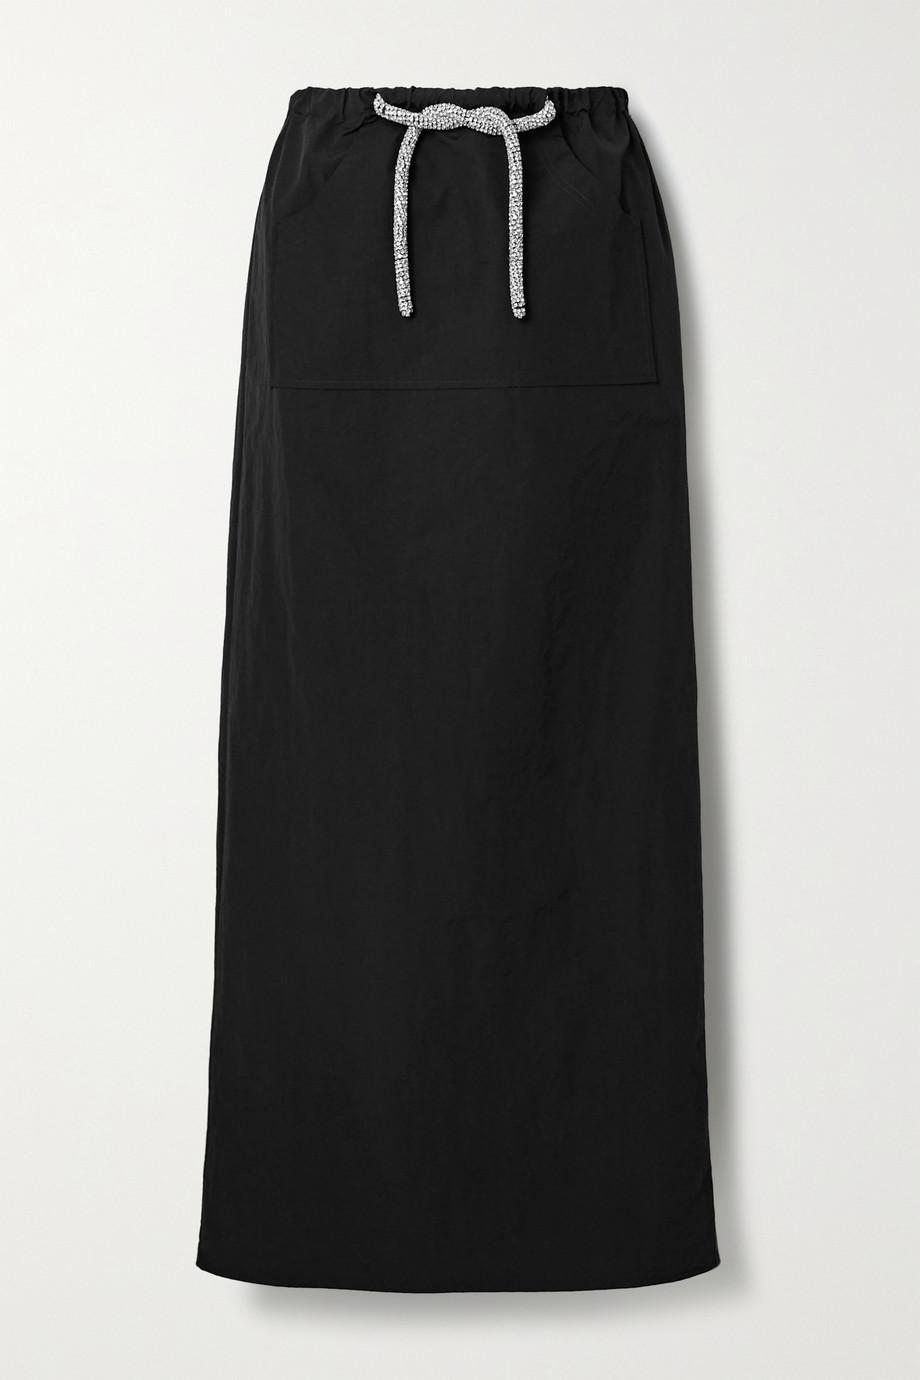 Christopher Esber Cargo crystal-embellished taffeta maxi skirt